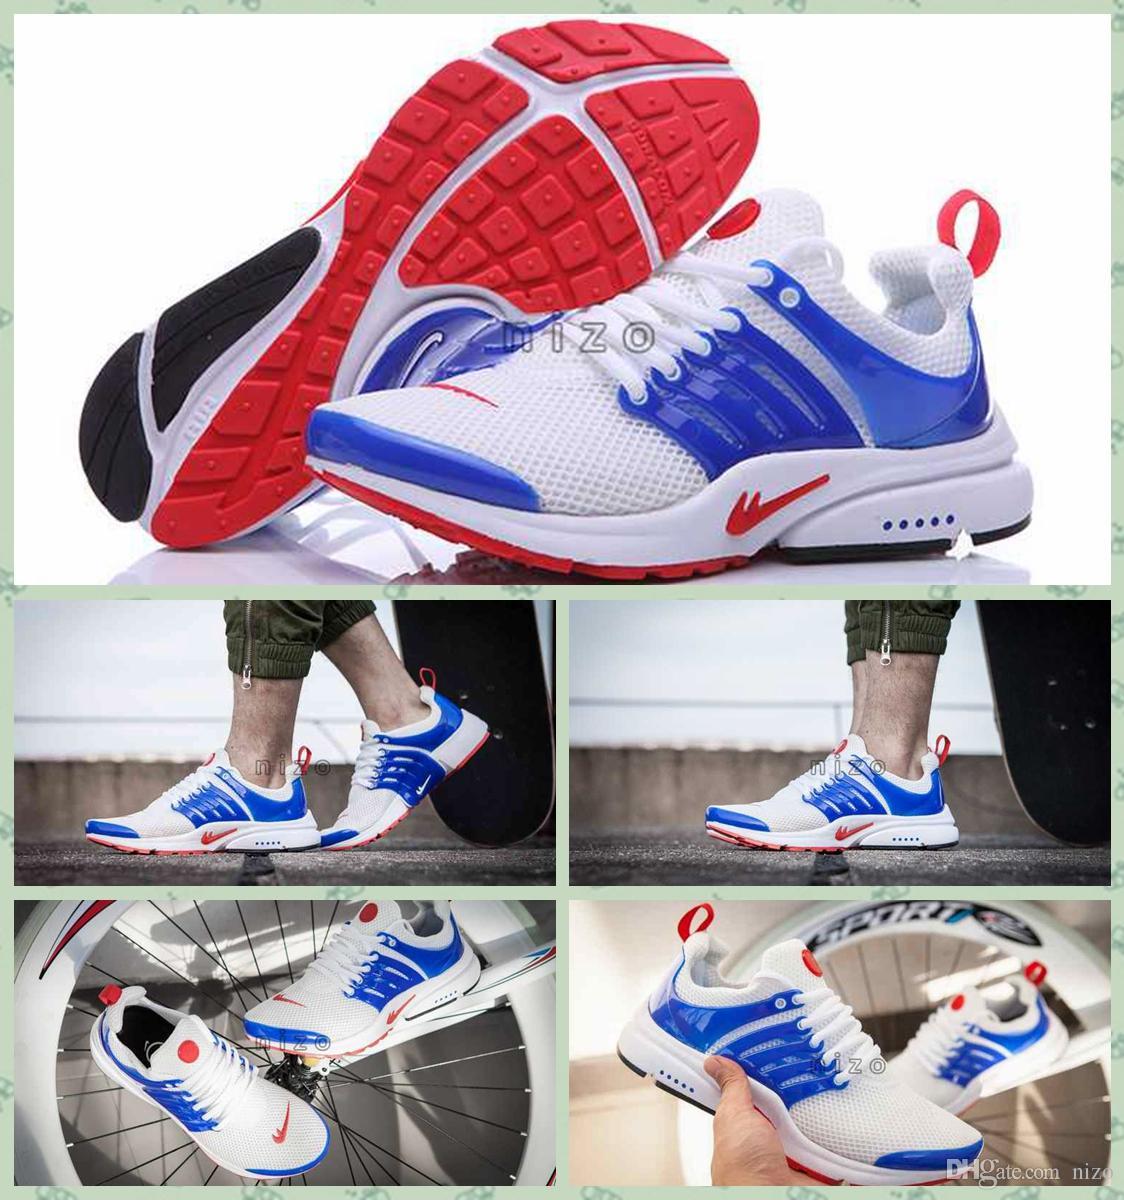 huge selection of c9572 66eb6 Acheter 2016 Nouveaux Air Presto GPX Olympic USA Chaussures American Flag  Femmes Et Hommes Chaussures De Course Mesh Air Presto Chaussures Taille 36  45 De ...